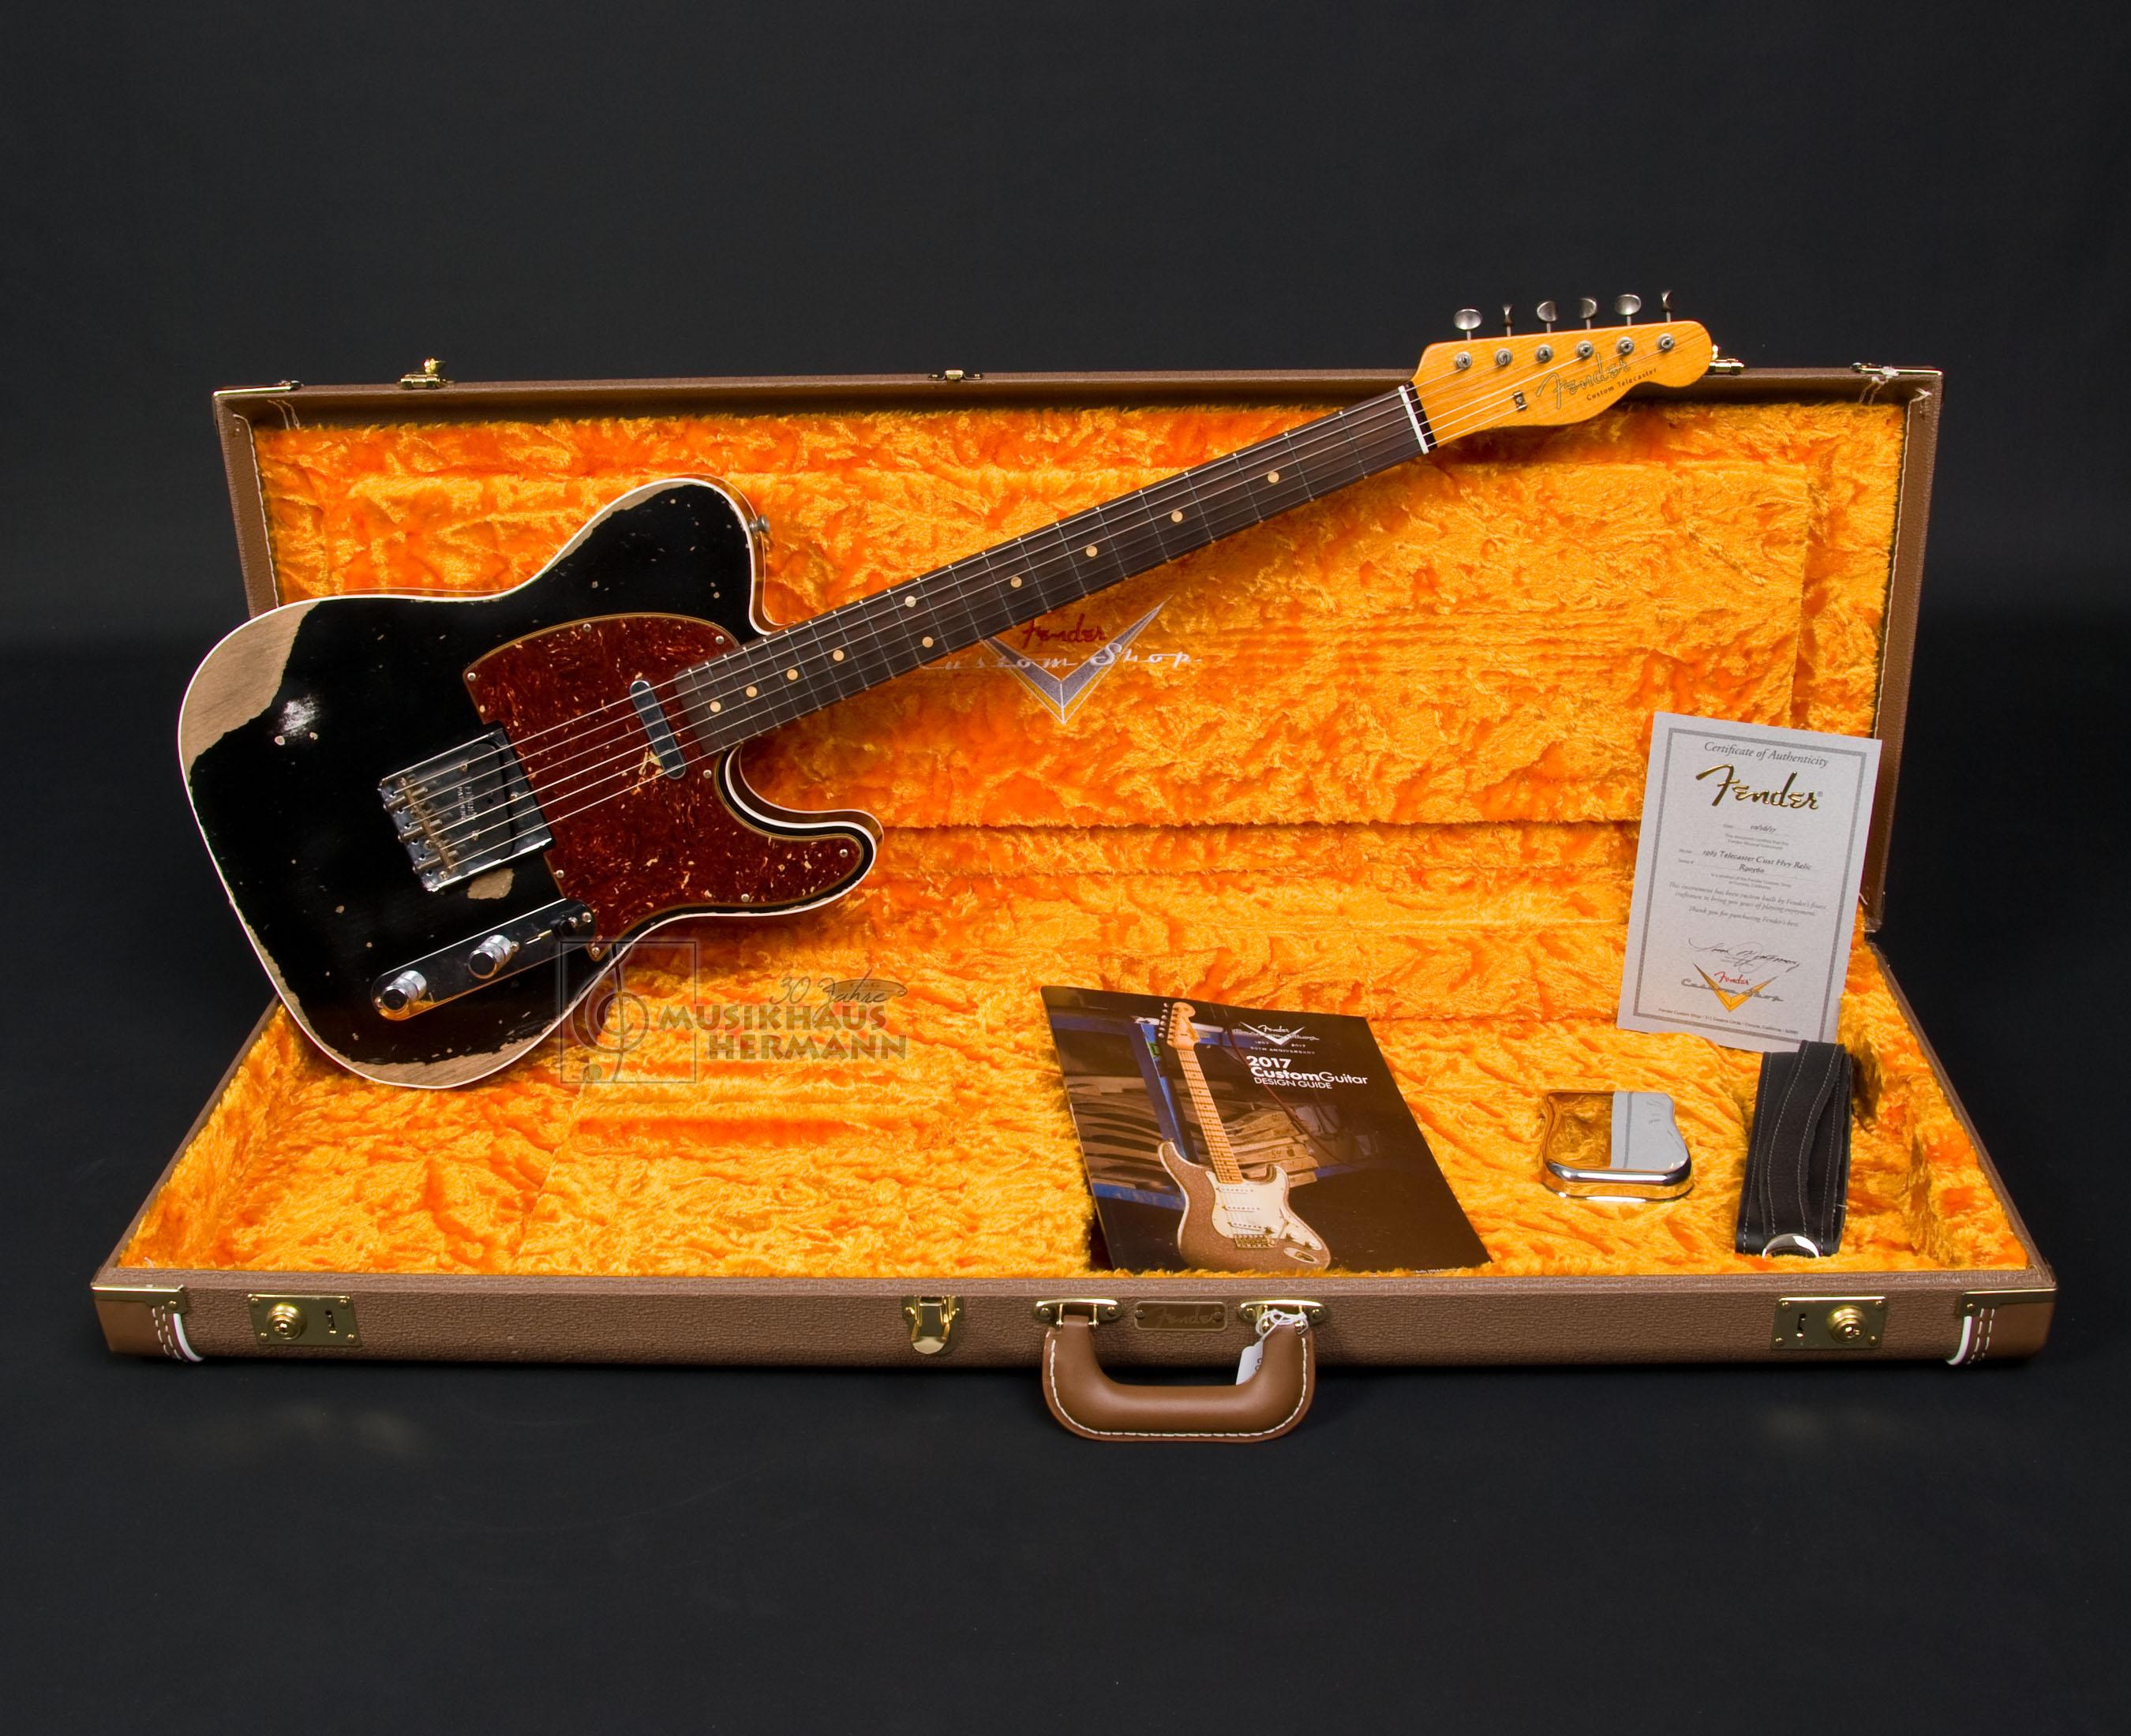 Charmant Fender Telecaster Schaltplan Ideen - Elektrische Schaltplan ...